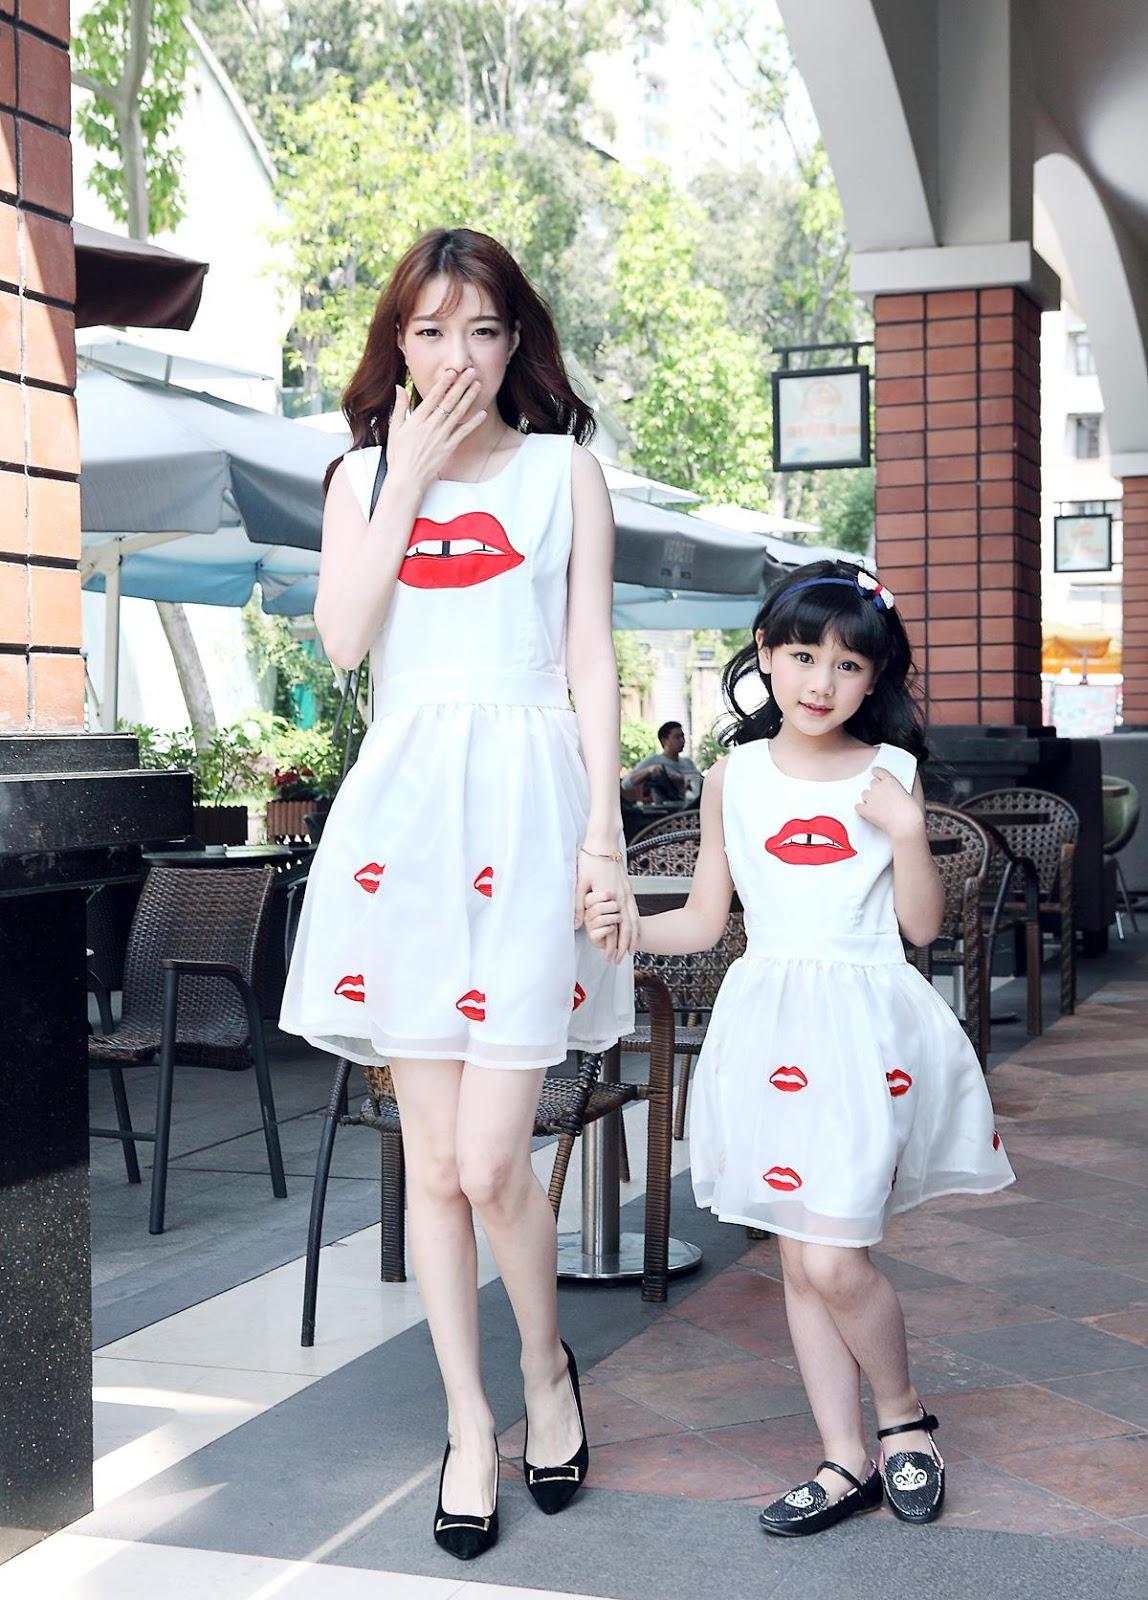 20 Baju Dress Korea Style Untuk Ibu Dan Anak Perempuan -3784